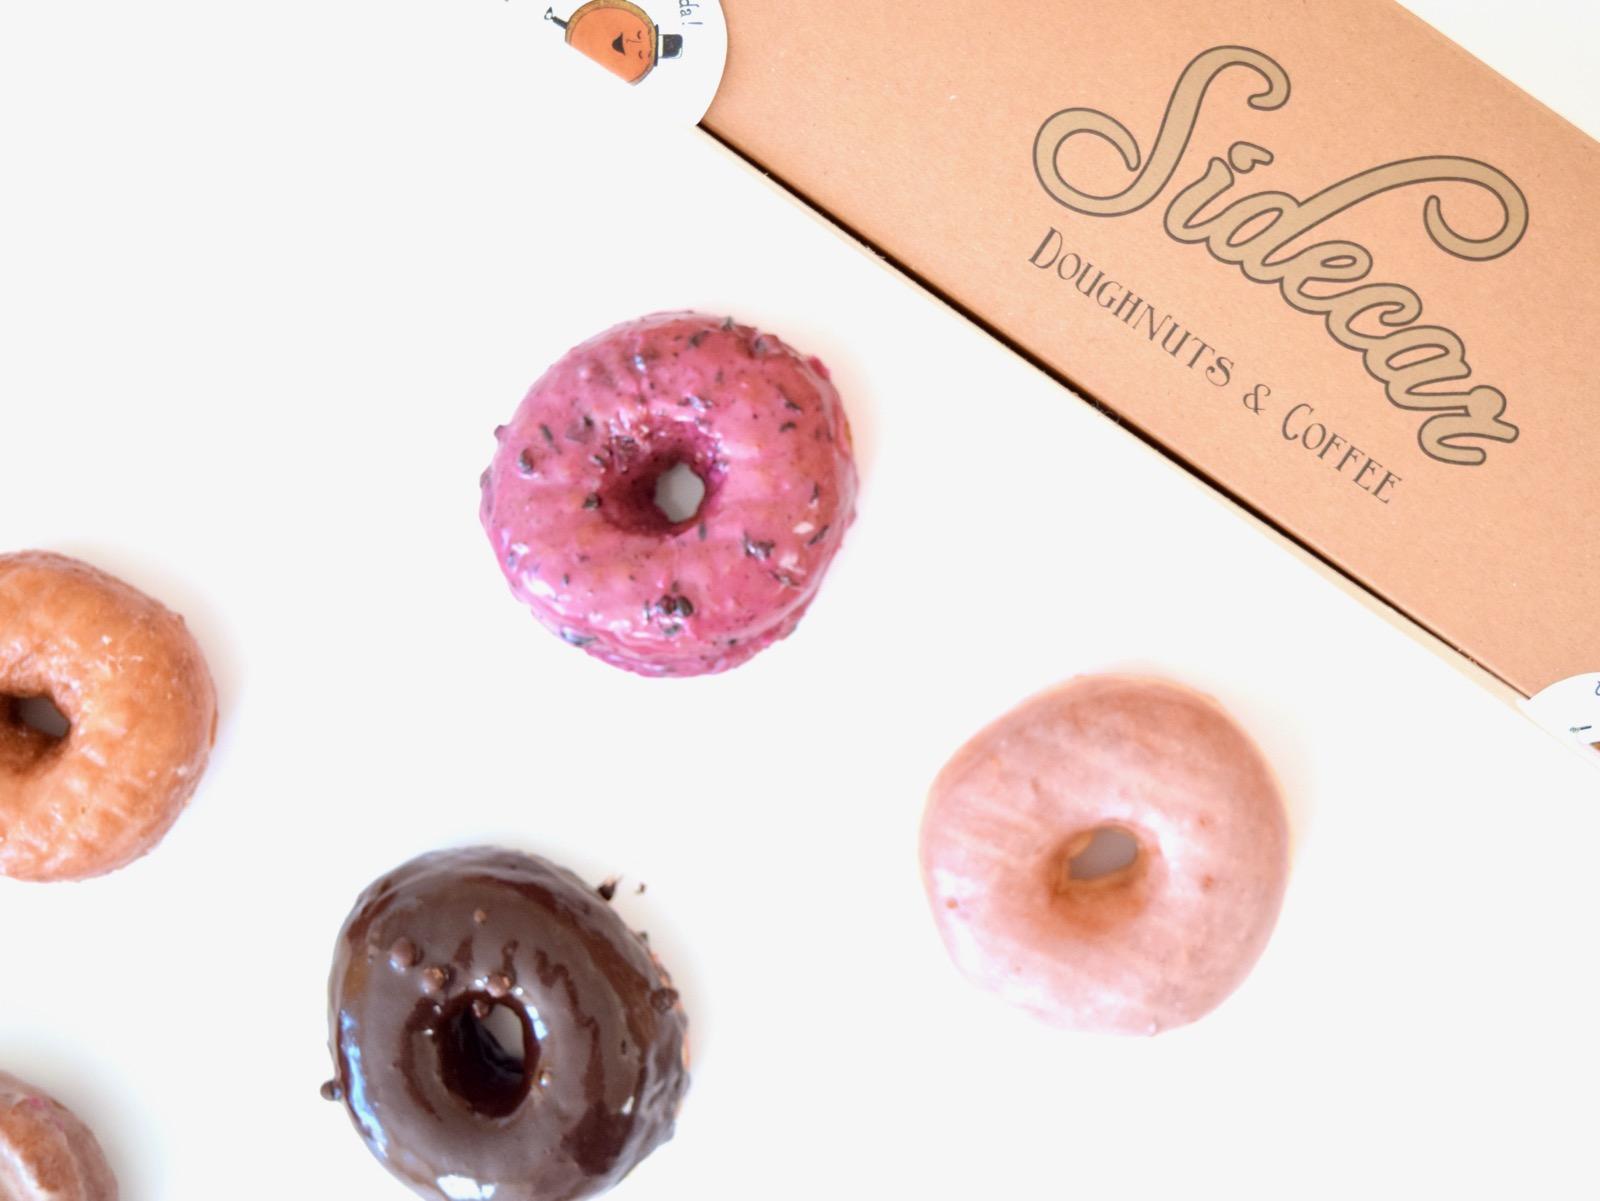 Sidecar Doughnuts Los Angeles